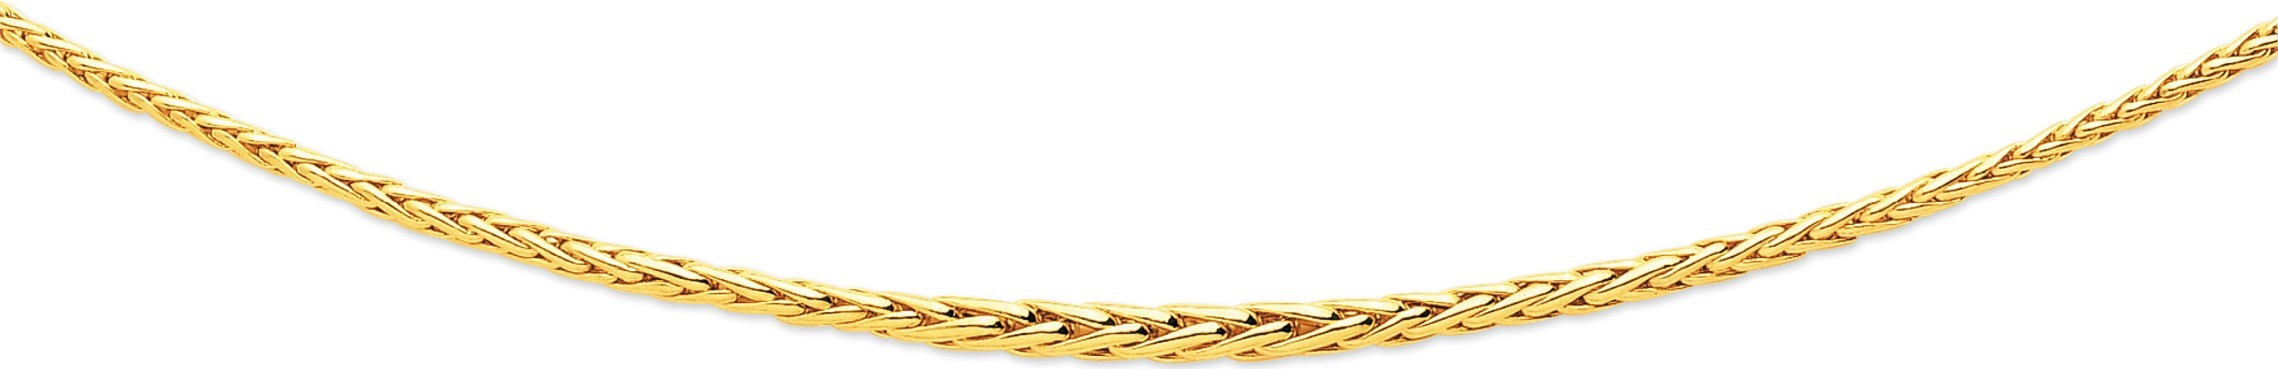 bijoux-or collier maille palmier 2323